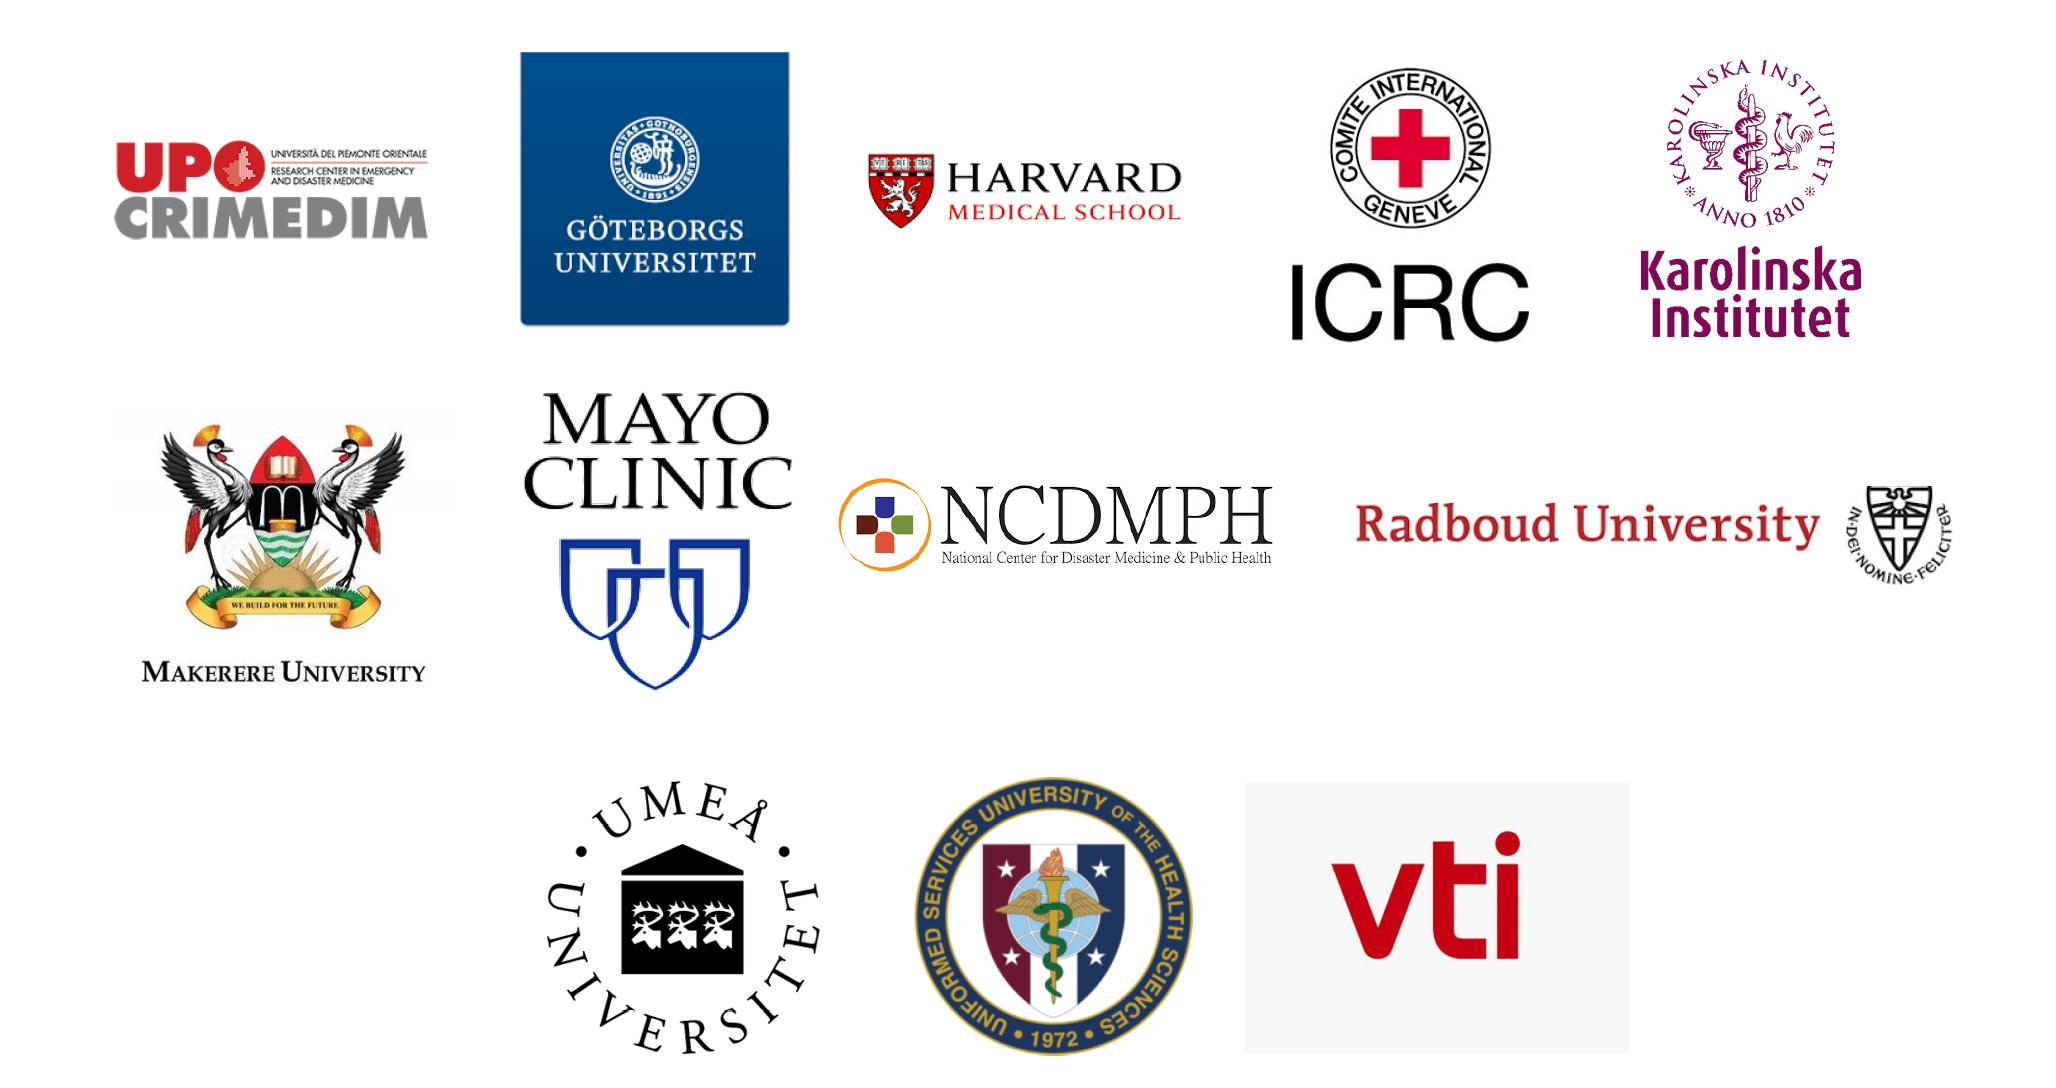 Logotypes of collaborators to KMC